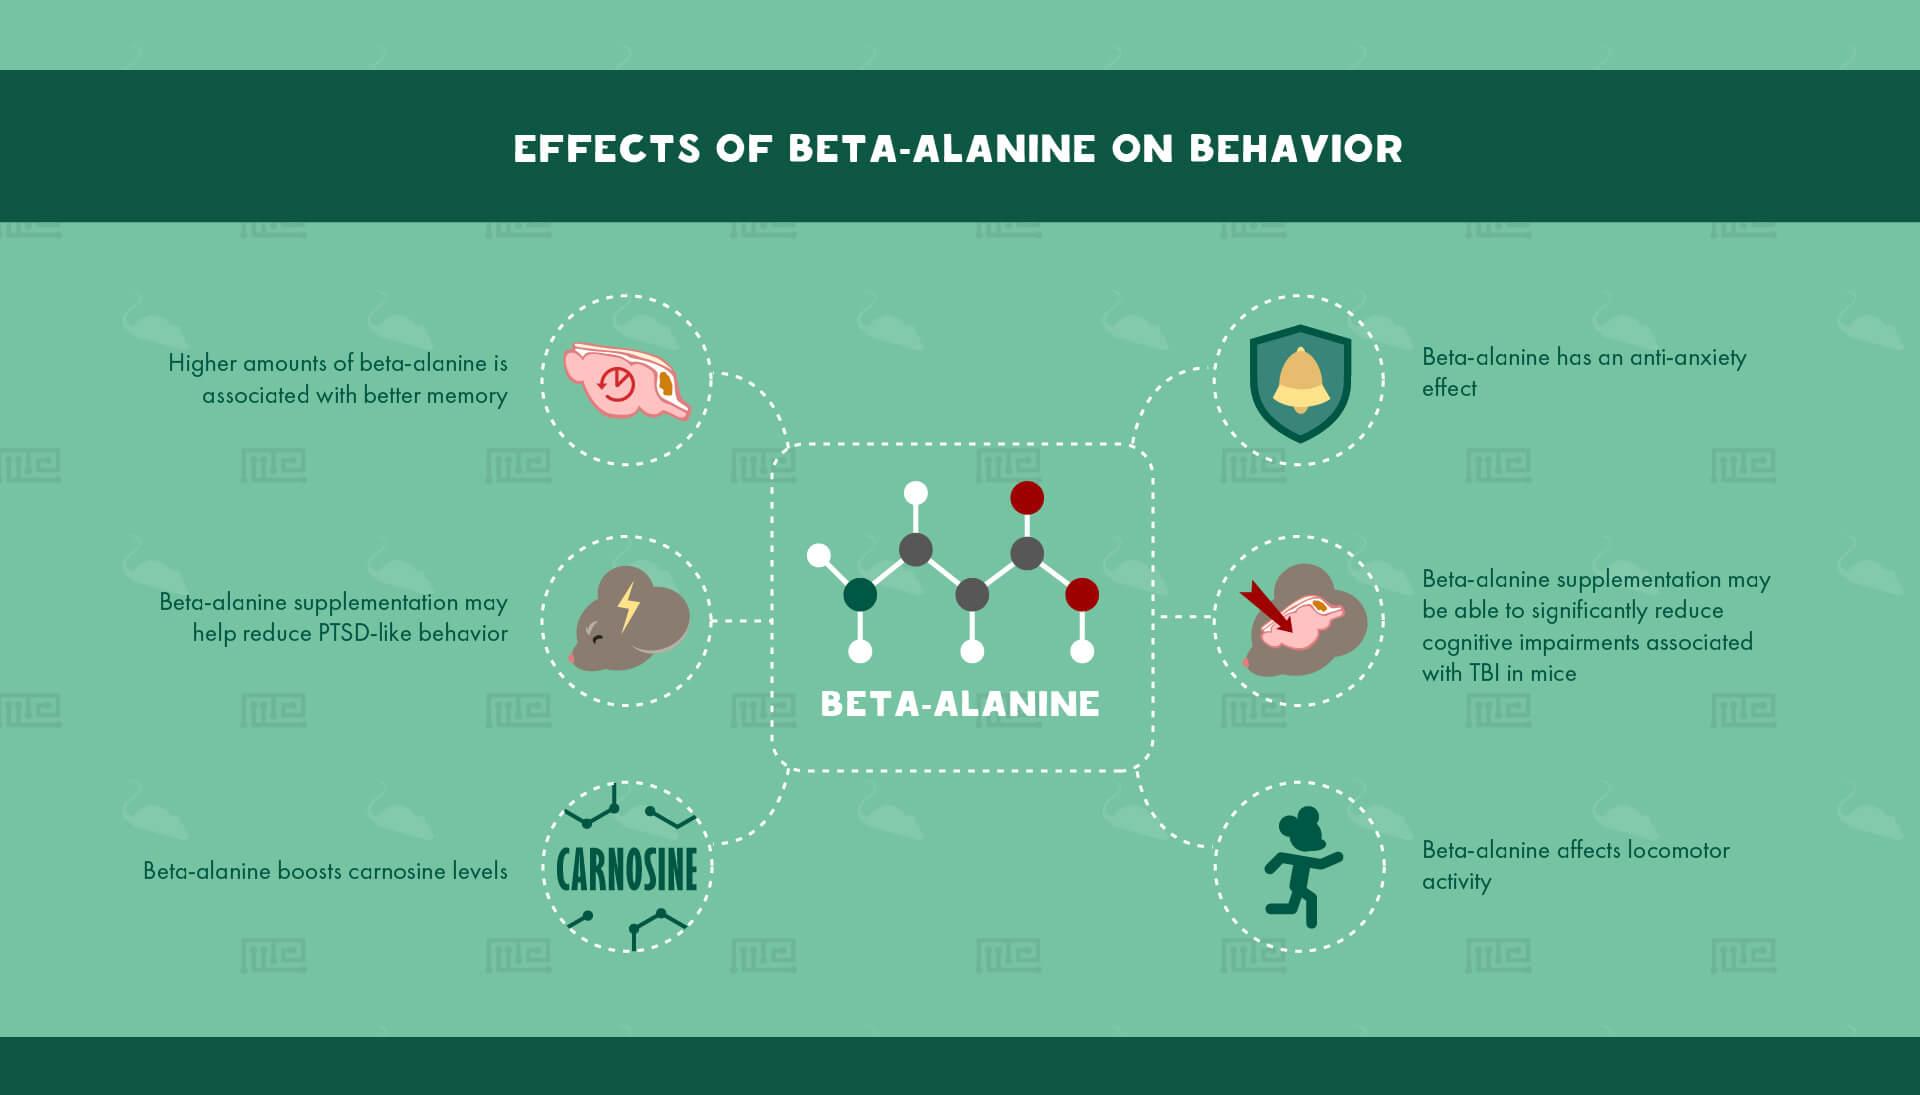 1_Effects of Beta-Alanine on Behavior